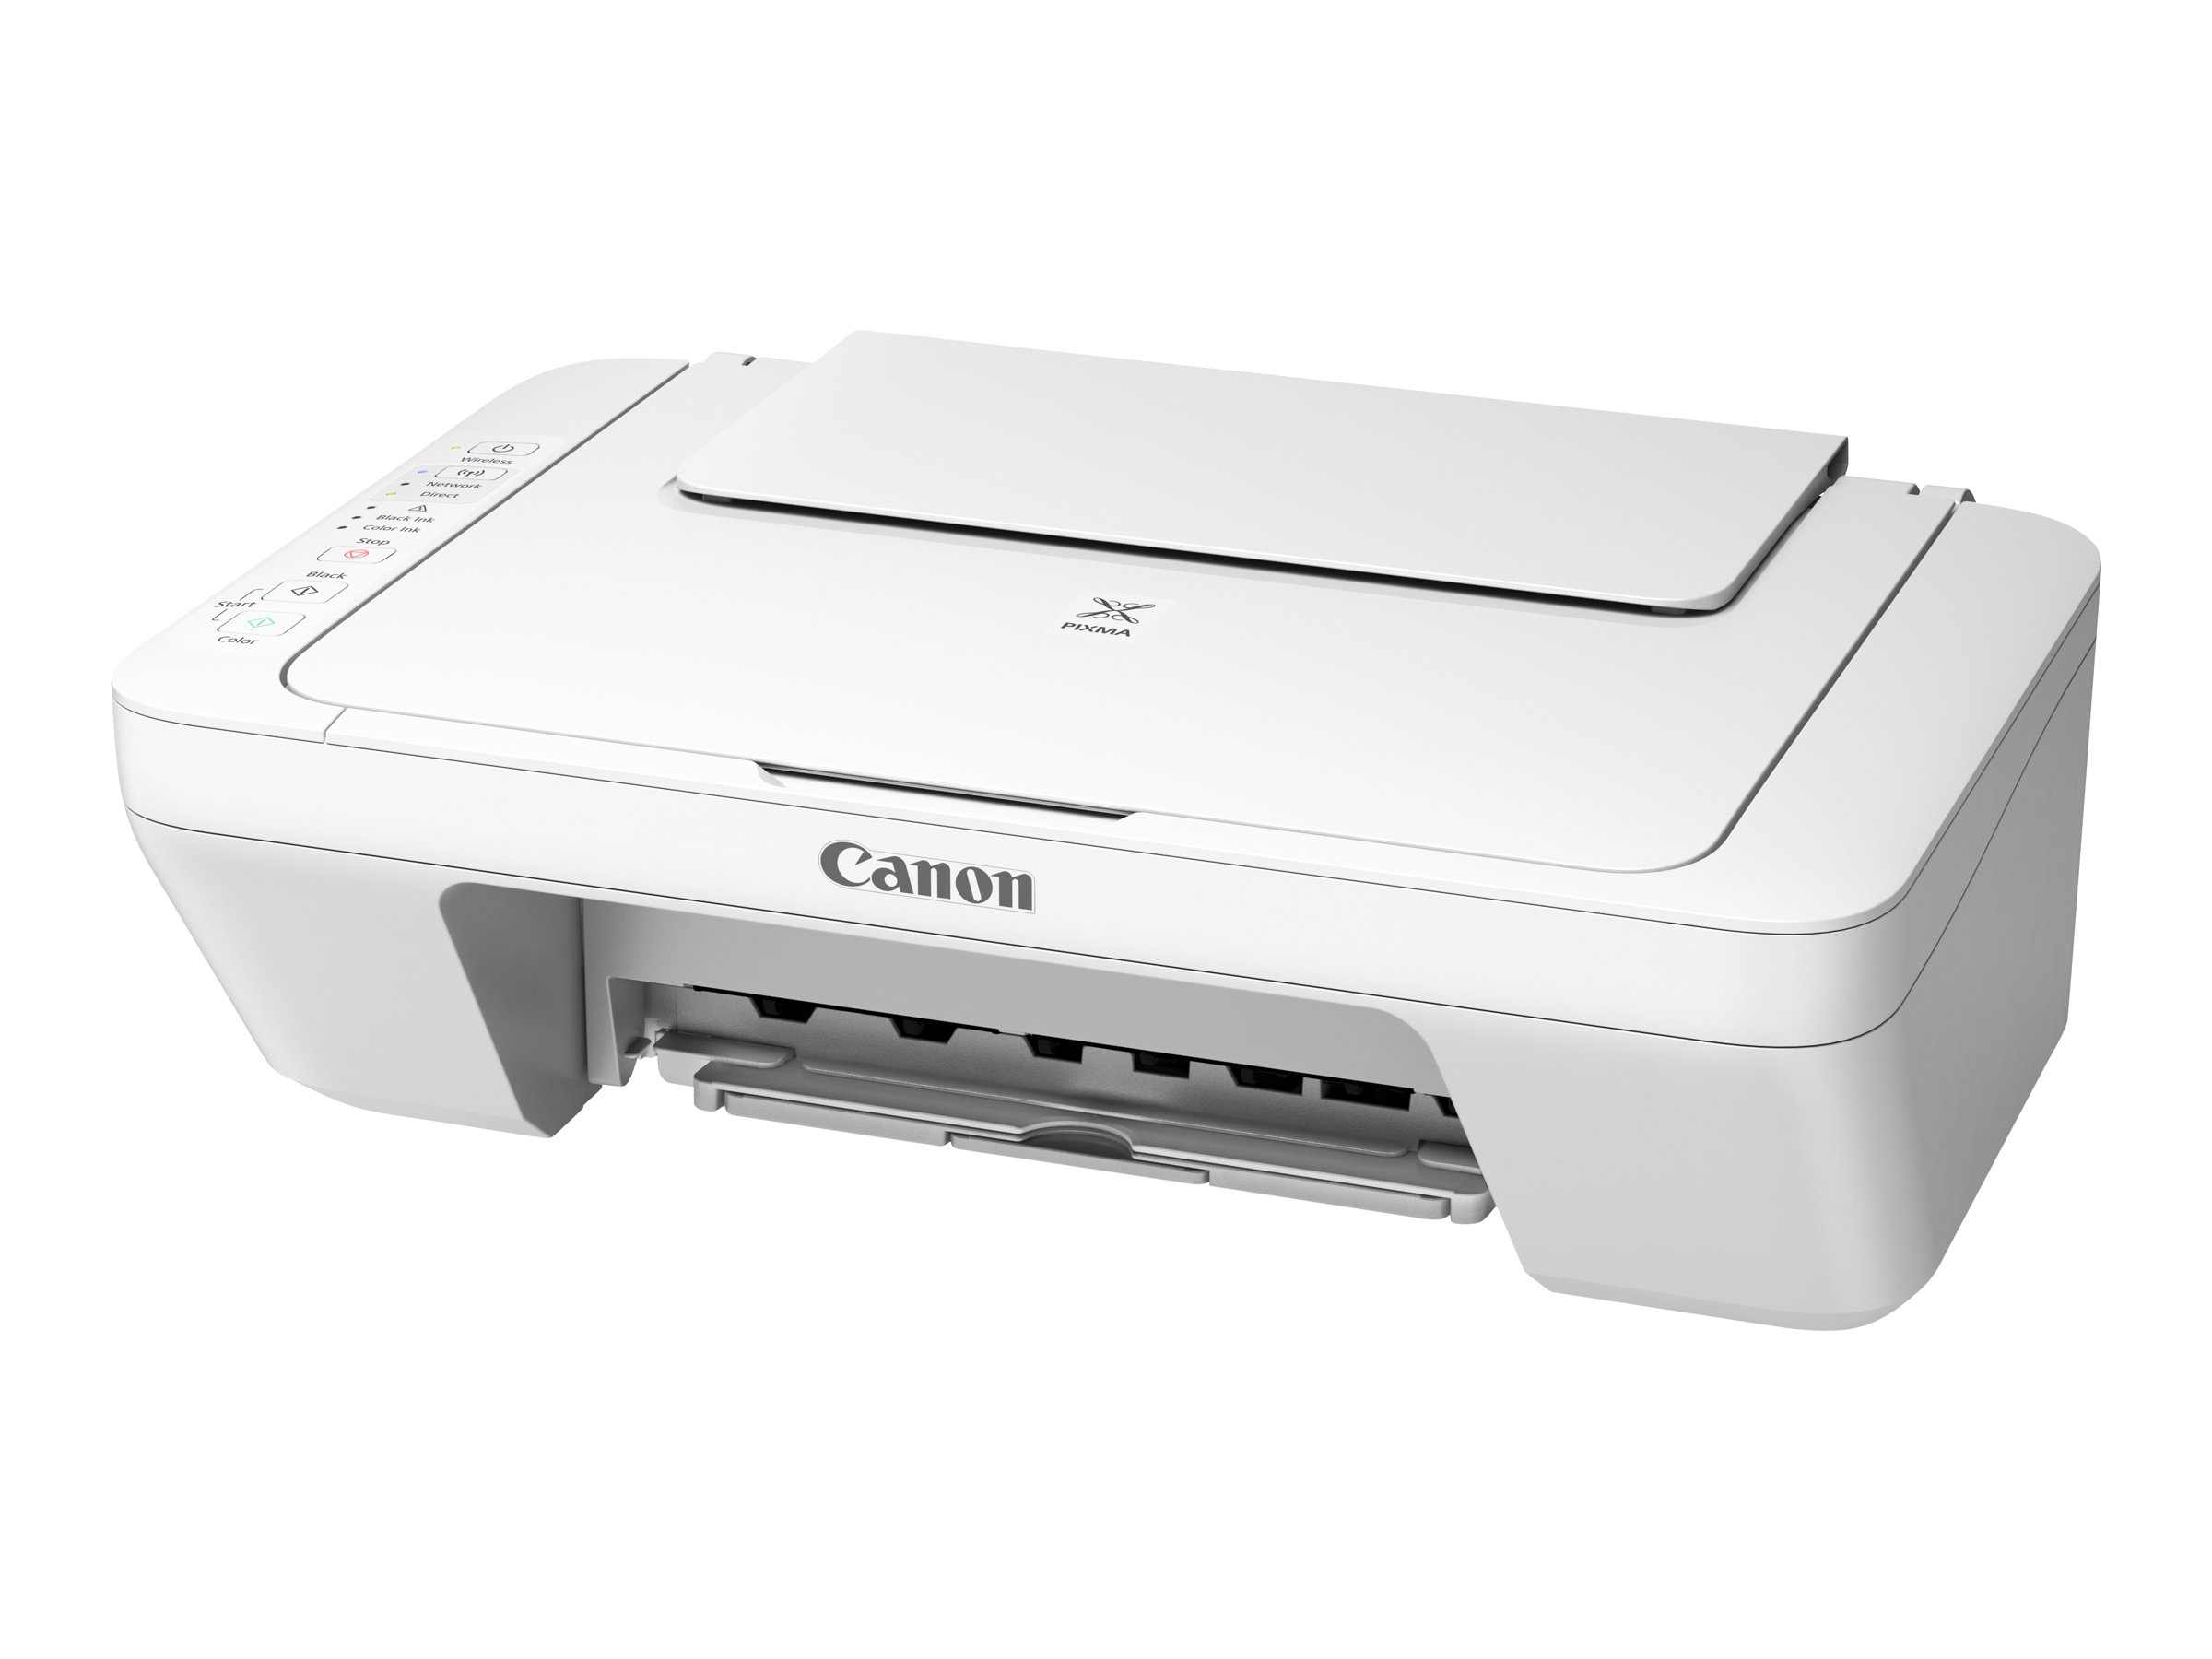 Canon PIXMA MG3051 - Multifunktionsdrucker